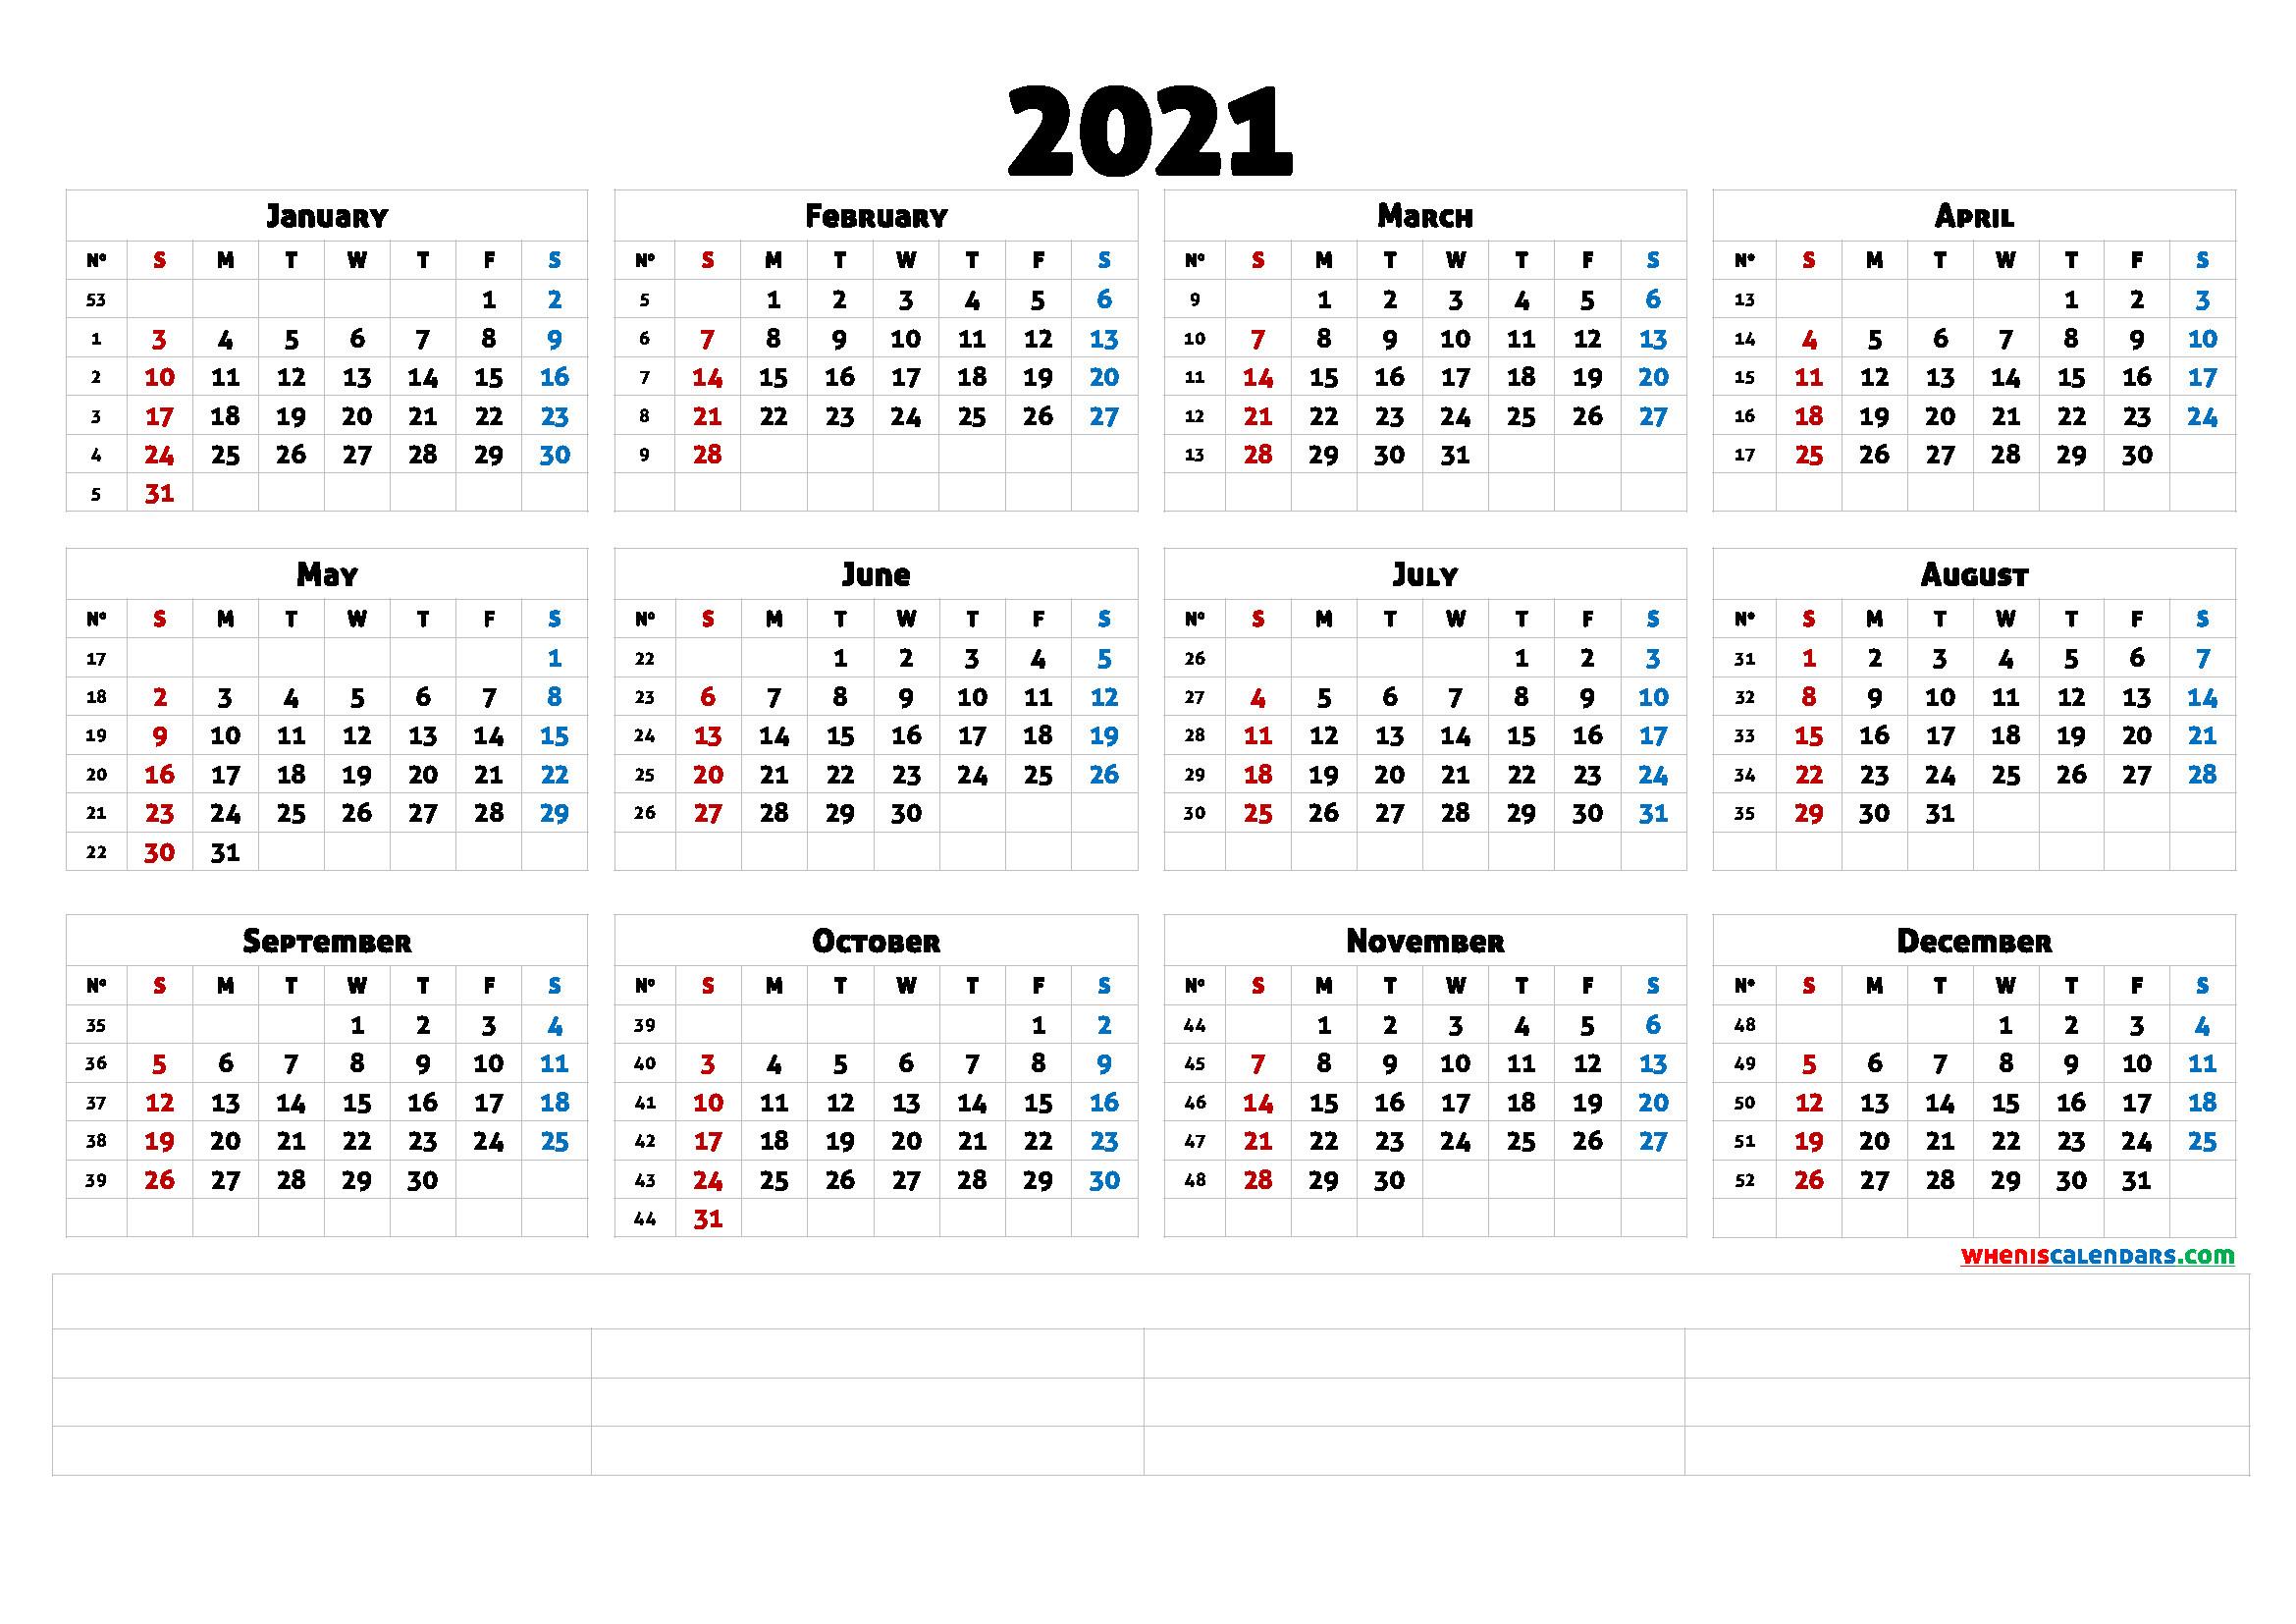 Free Printable Calendar Templates 2021 (6 Templates)  2021 12 Month Calendar Printable Free Pdf